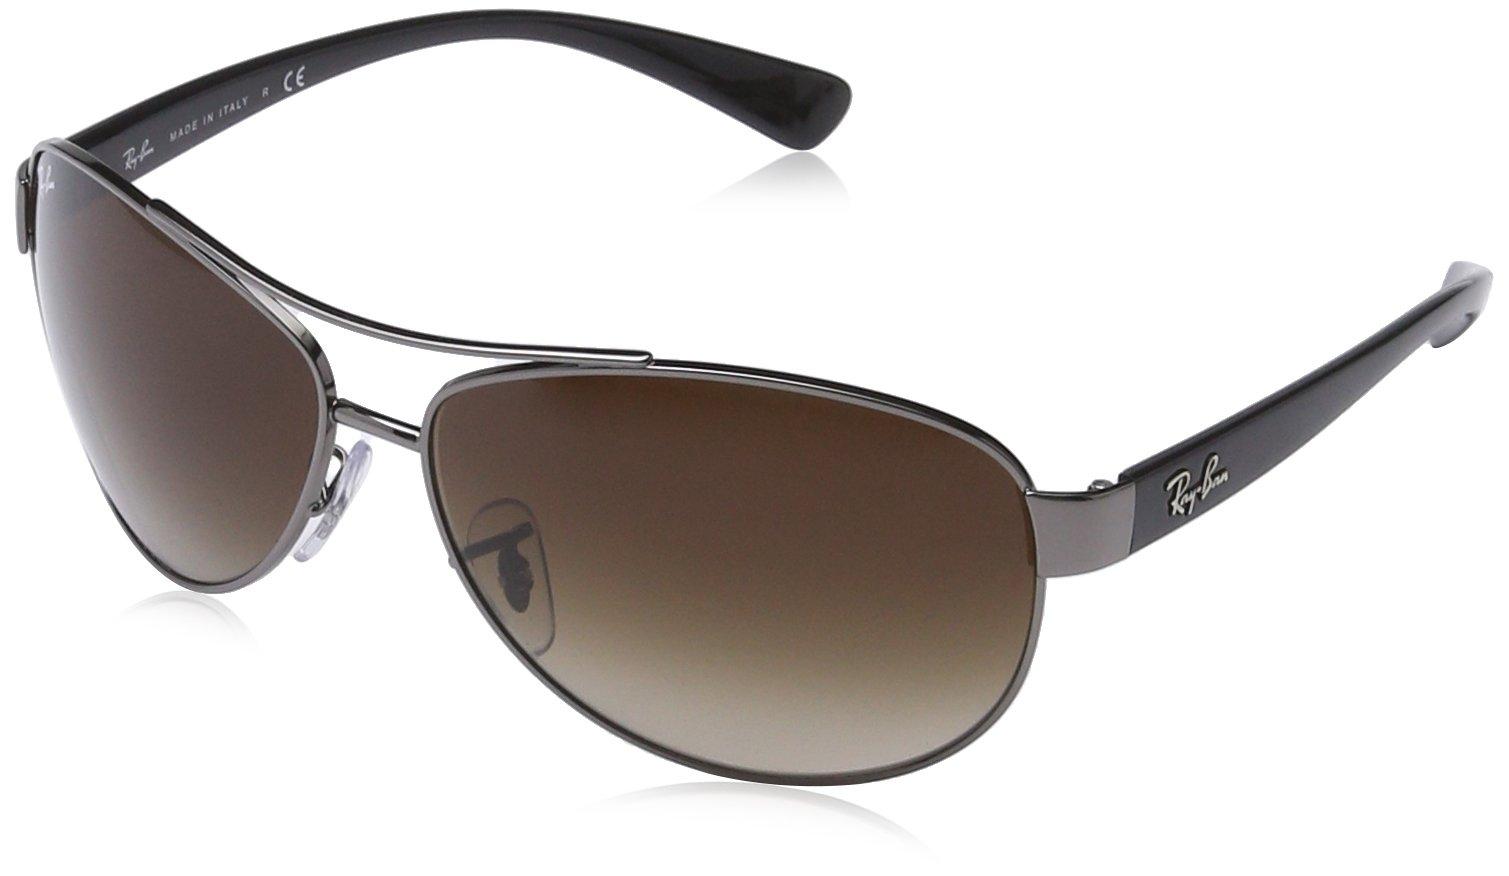 Ray-Ban Rb3386 Polarized Aviator Sunglasses, Gunmetal, 63 mm